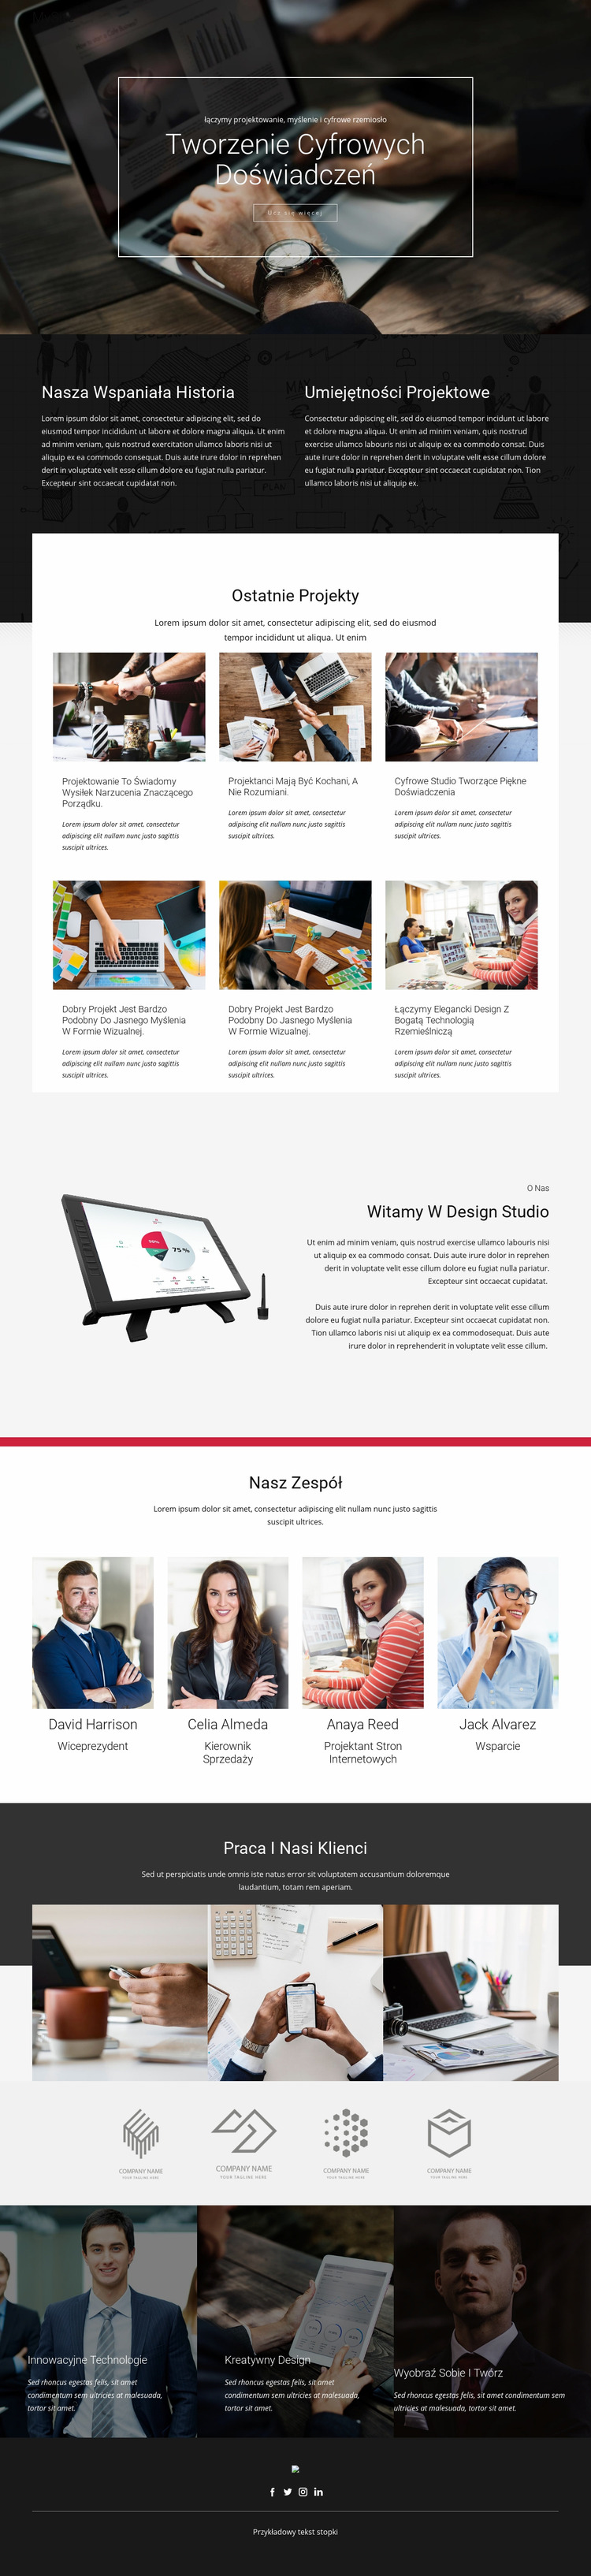 Crafting Digital Design Studio Szablon Joomla